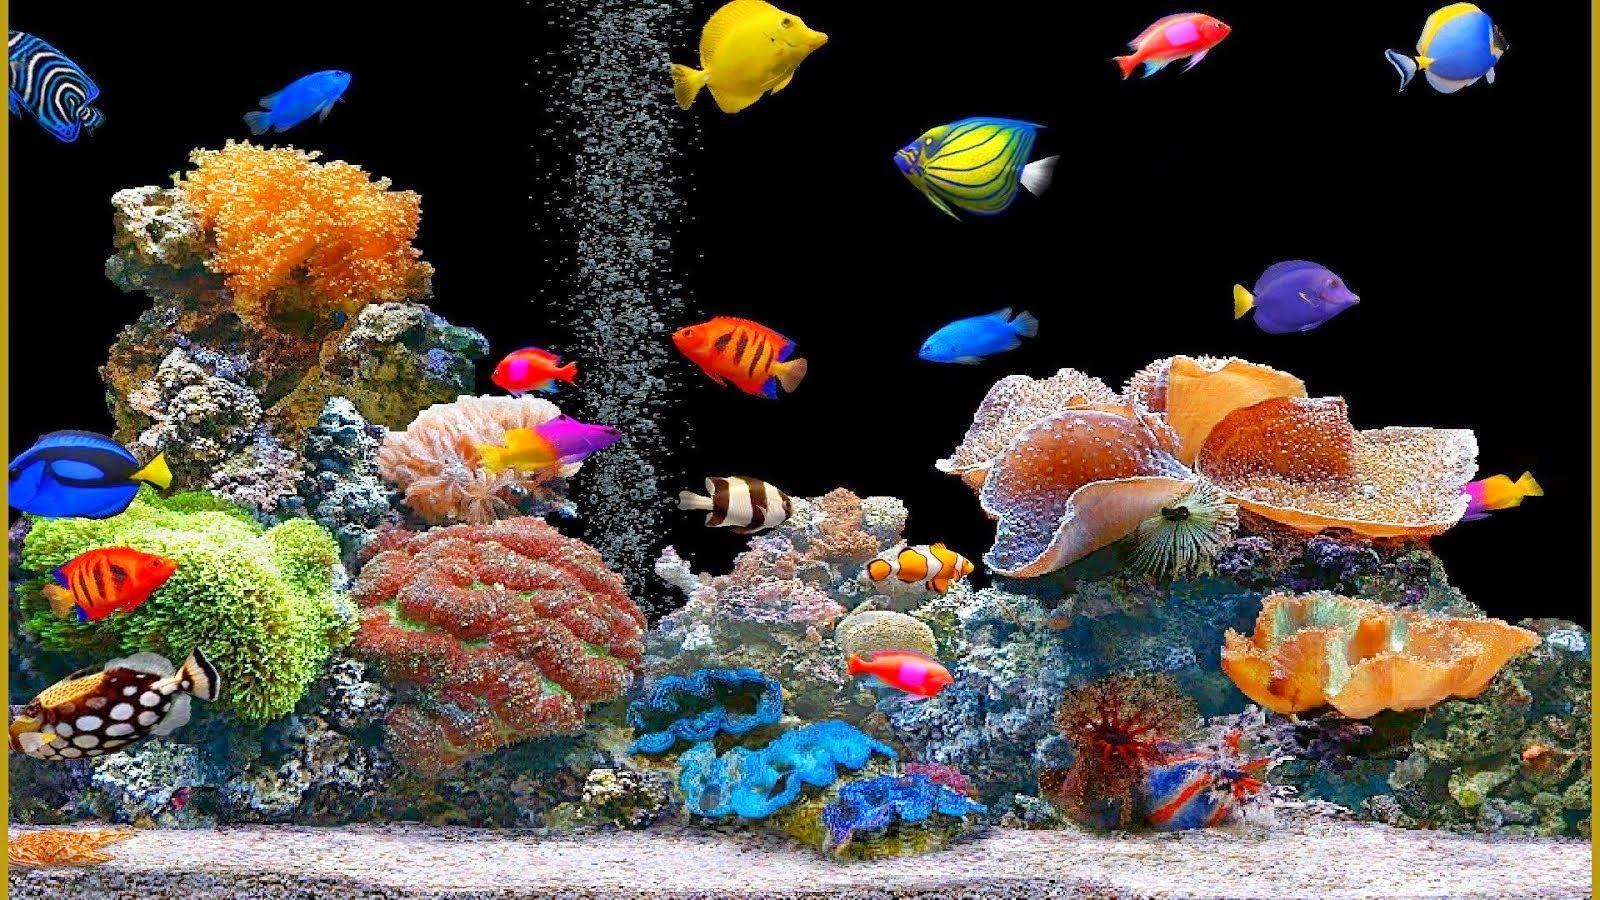 Animated Fish Tank Wallpaper Wallpaper Animated Aquarium live 1600x900